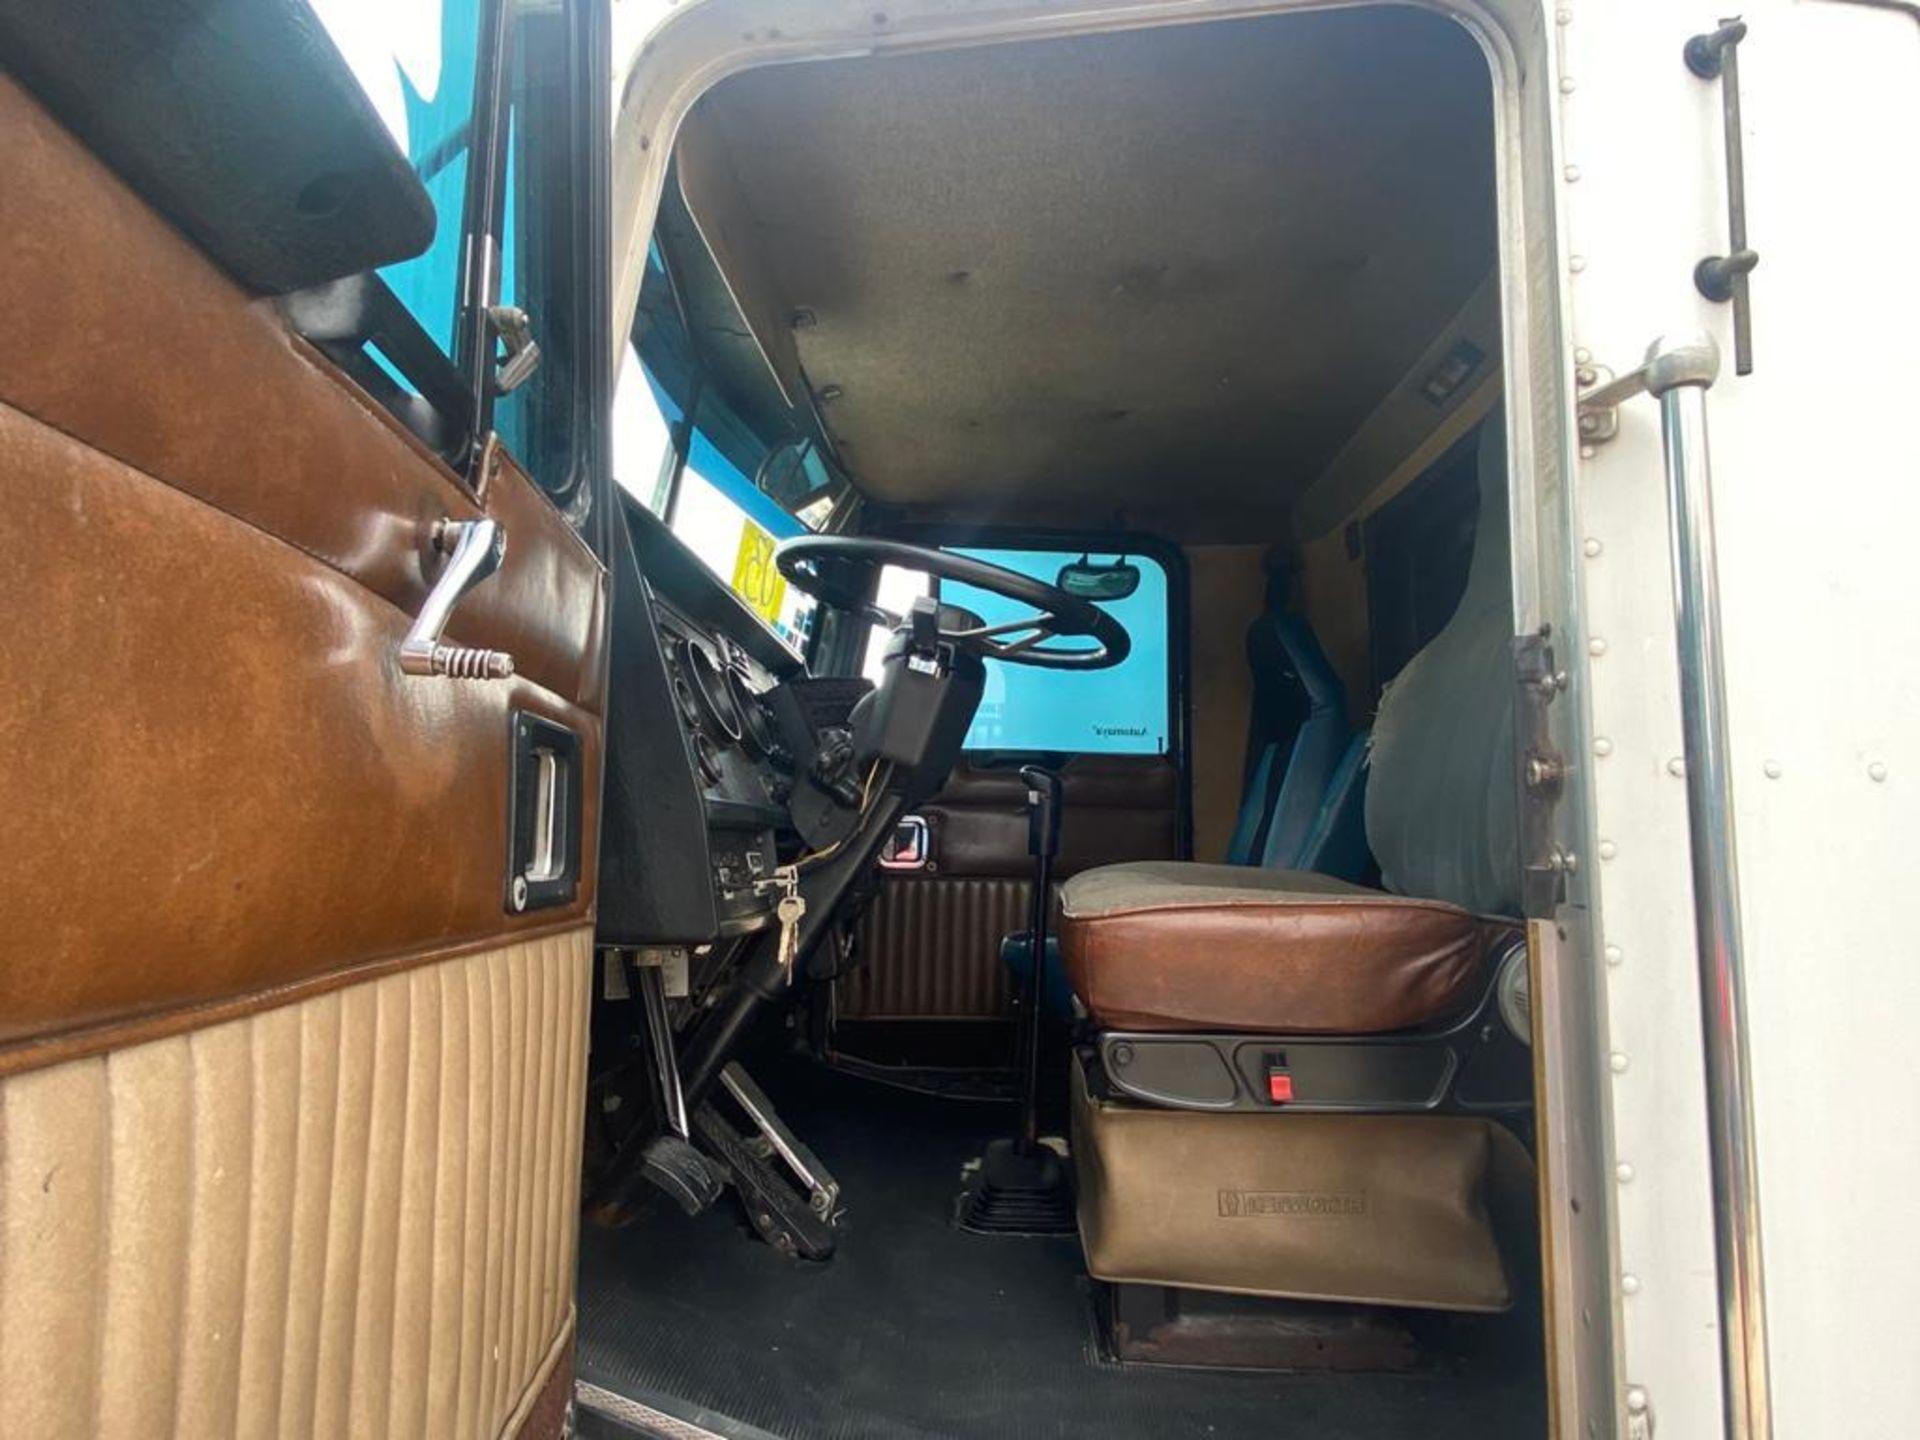 1999 Kenworth Sleeper truck tractor, standard transmission of 18 speeds - Image 25 of 62